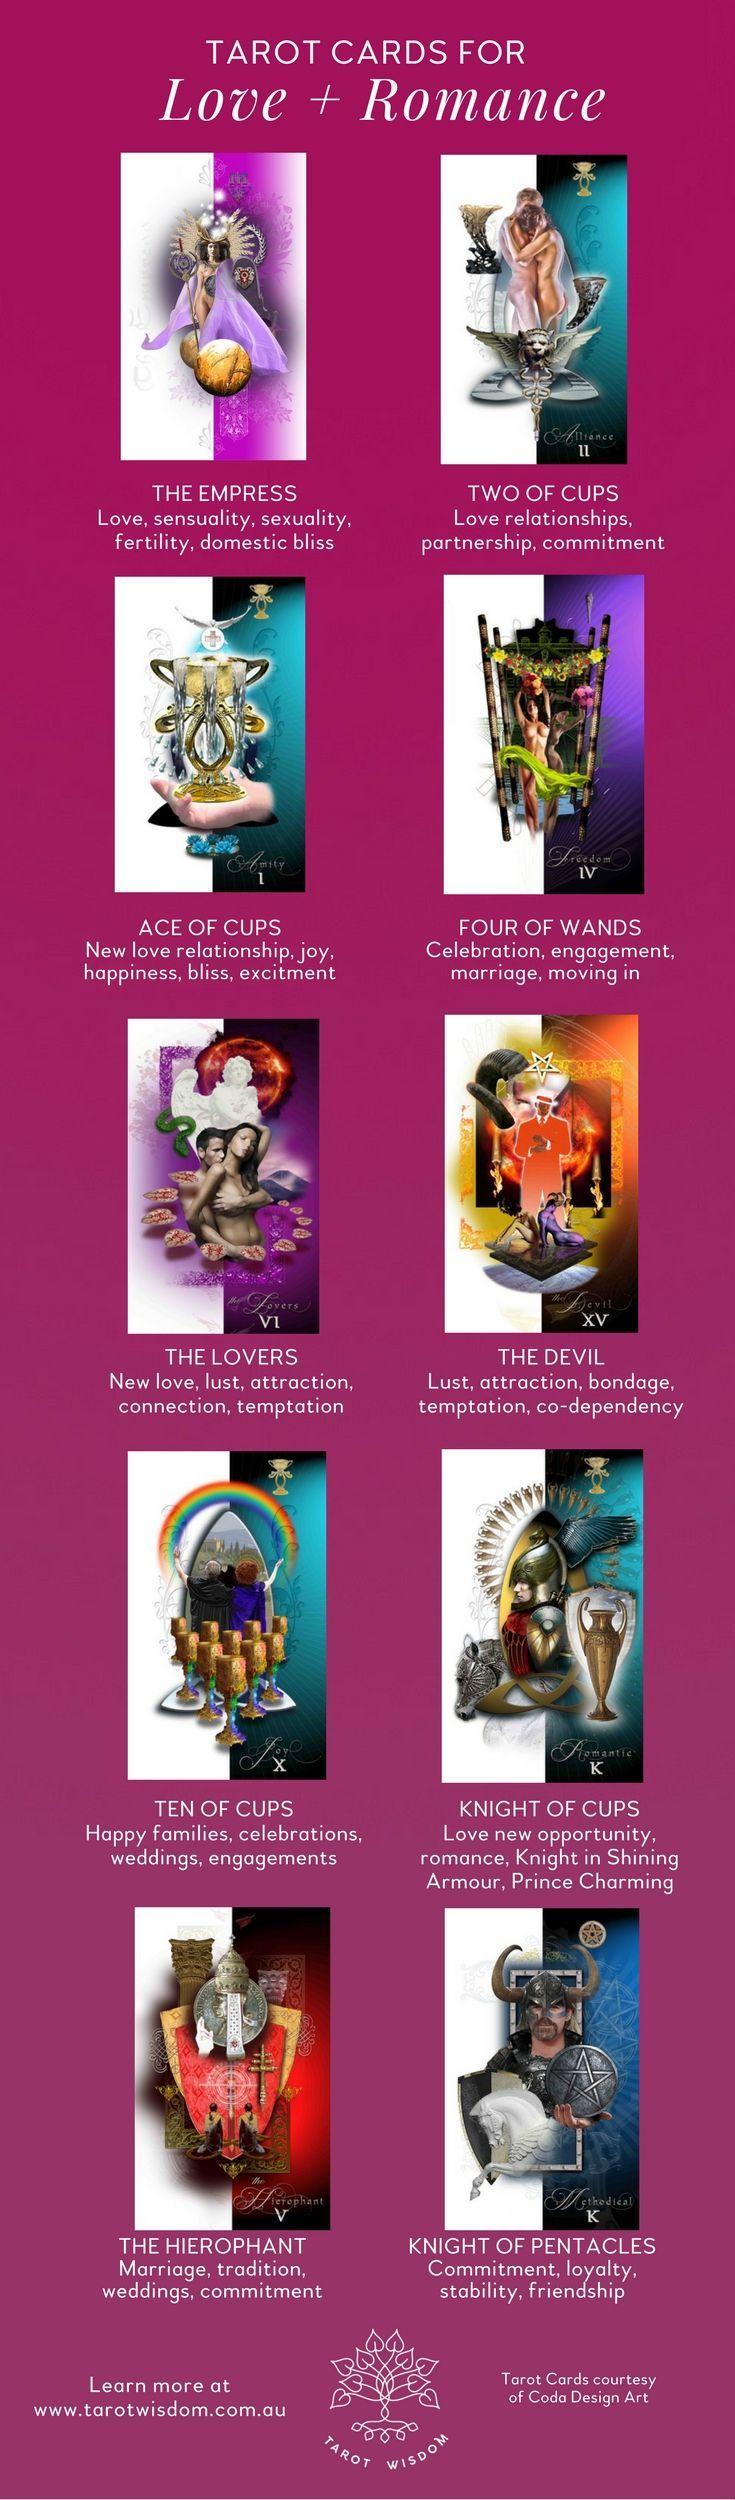 The top #Tarot Cards for #Love + Romance. To learn more about Tarot visit the website: www.tarotwisdom.com.au #tarotcardscheatsheets